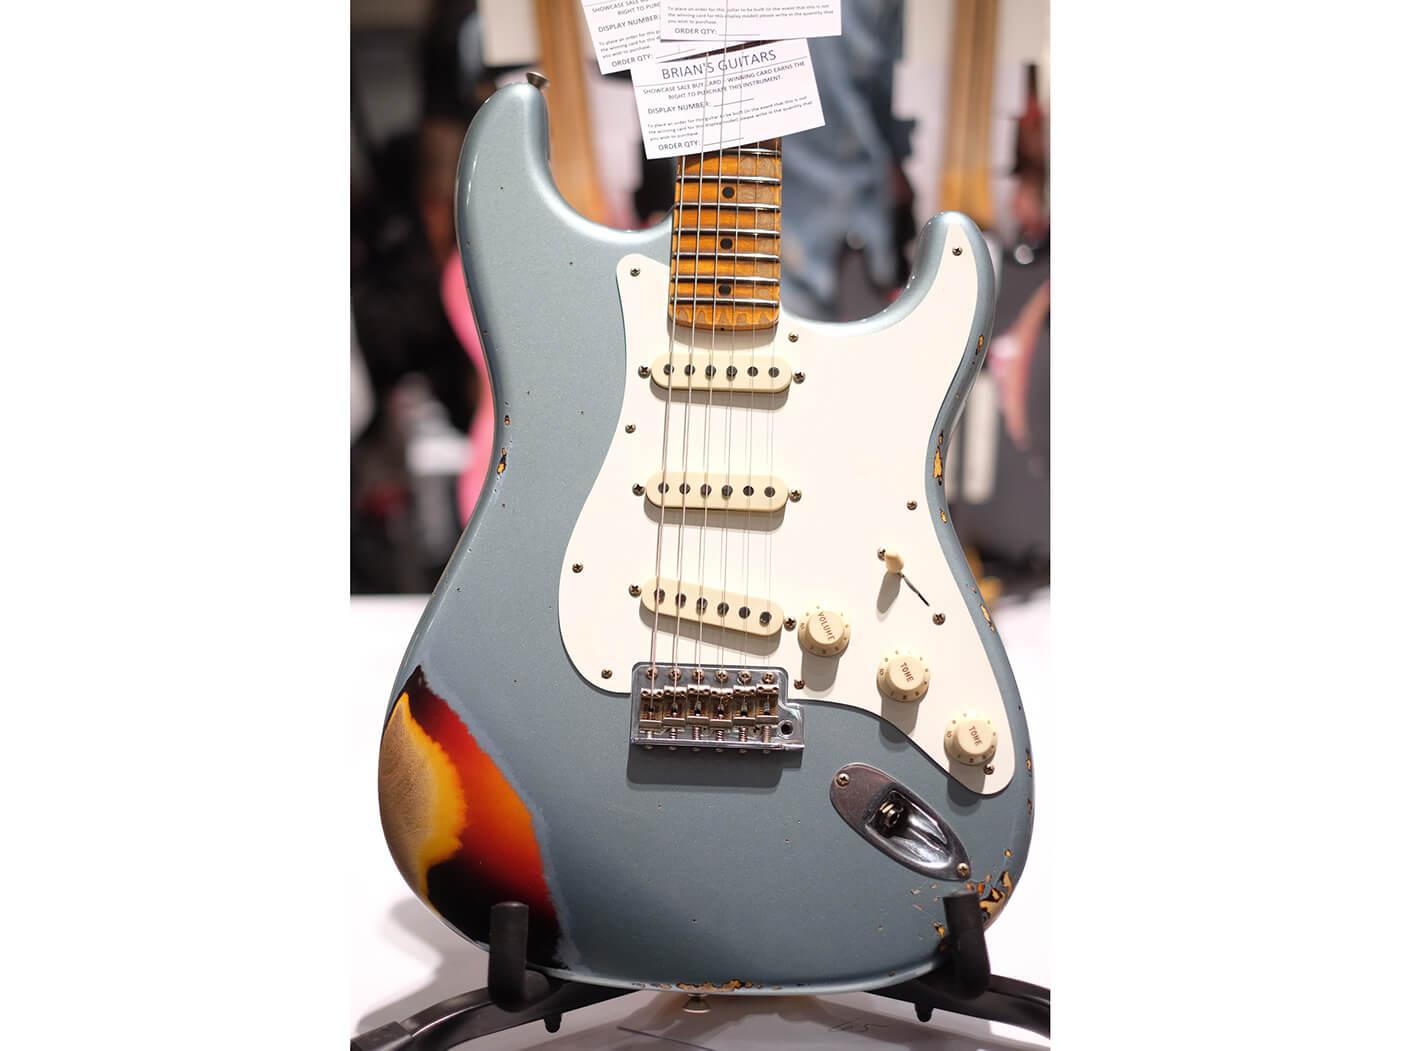 Limited Edition 1959 Stratocaster MN Journeyman Relic, Aged Blue Ice Metallic Over Chocolate 3 Tone Sunburst